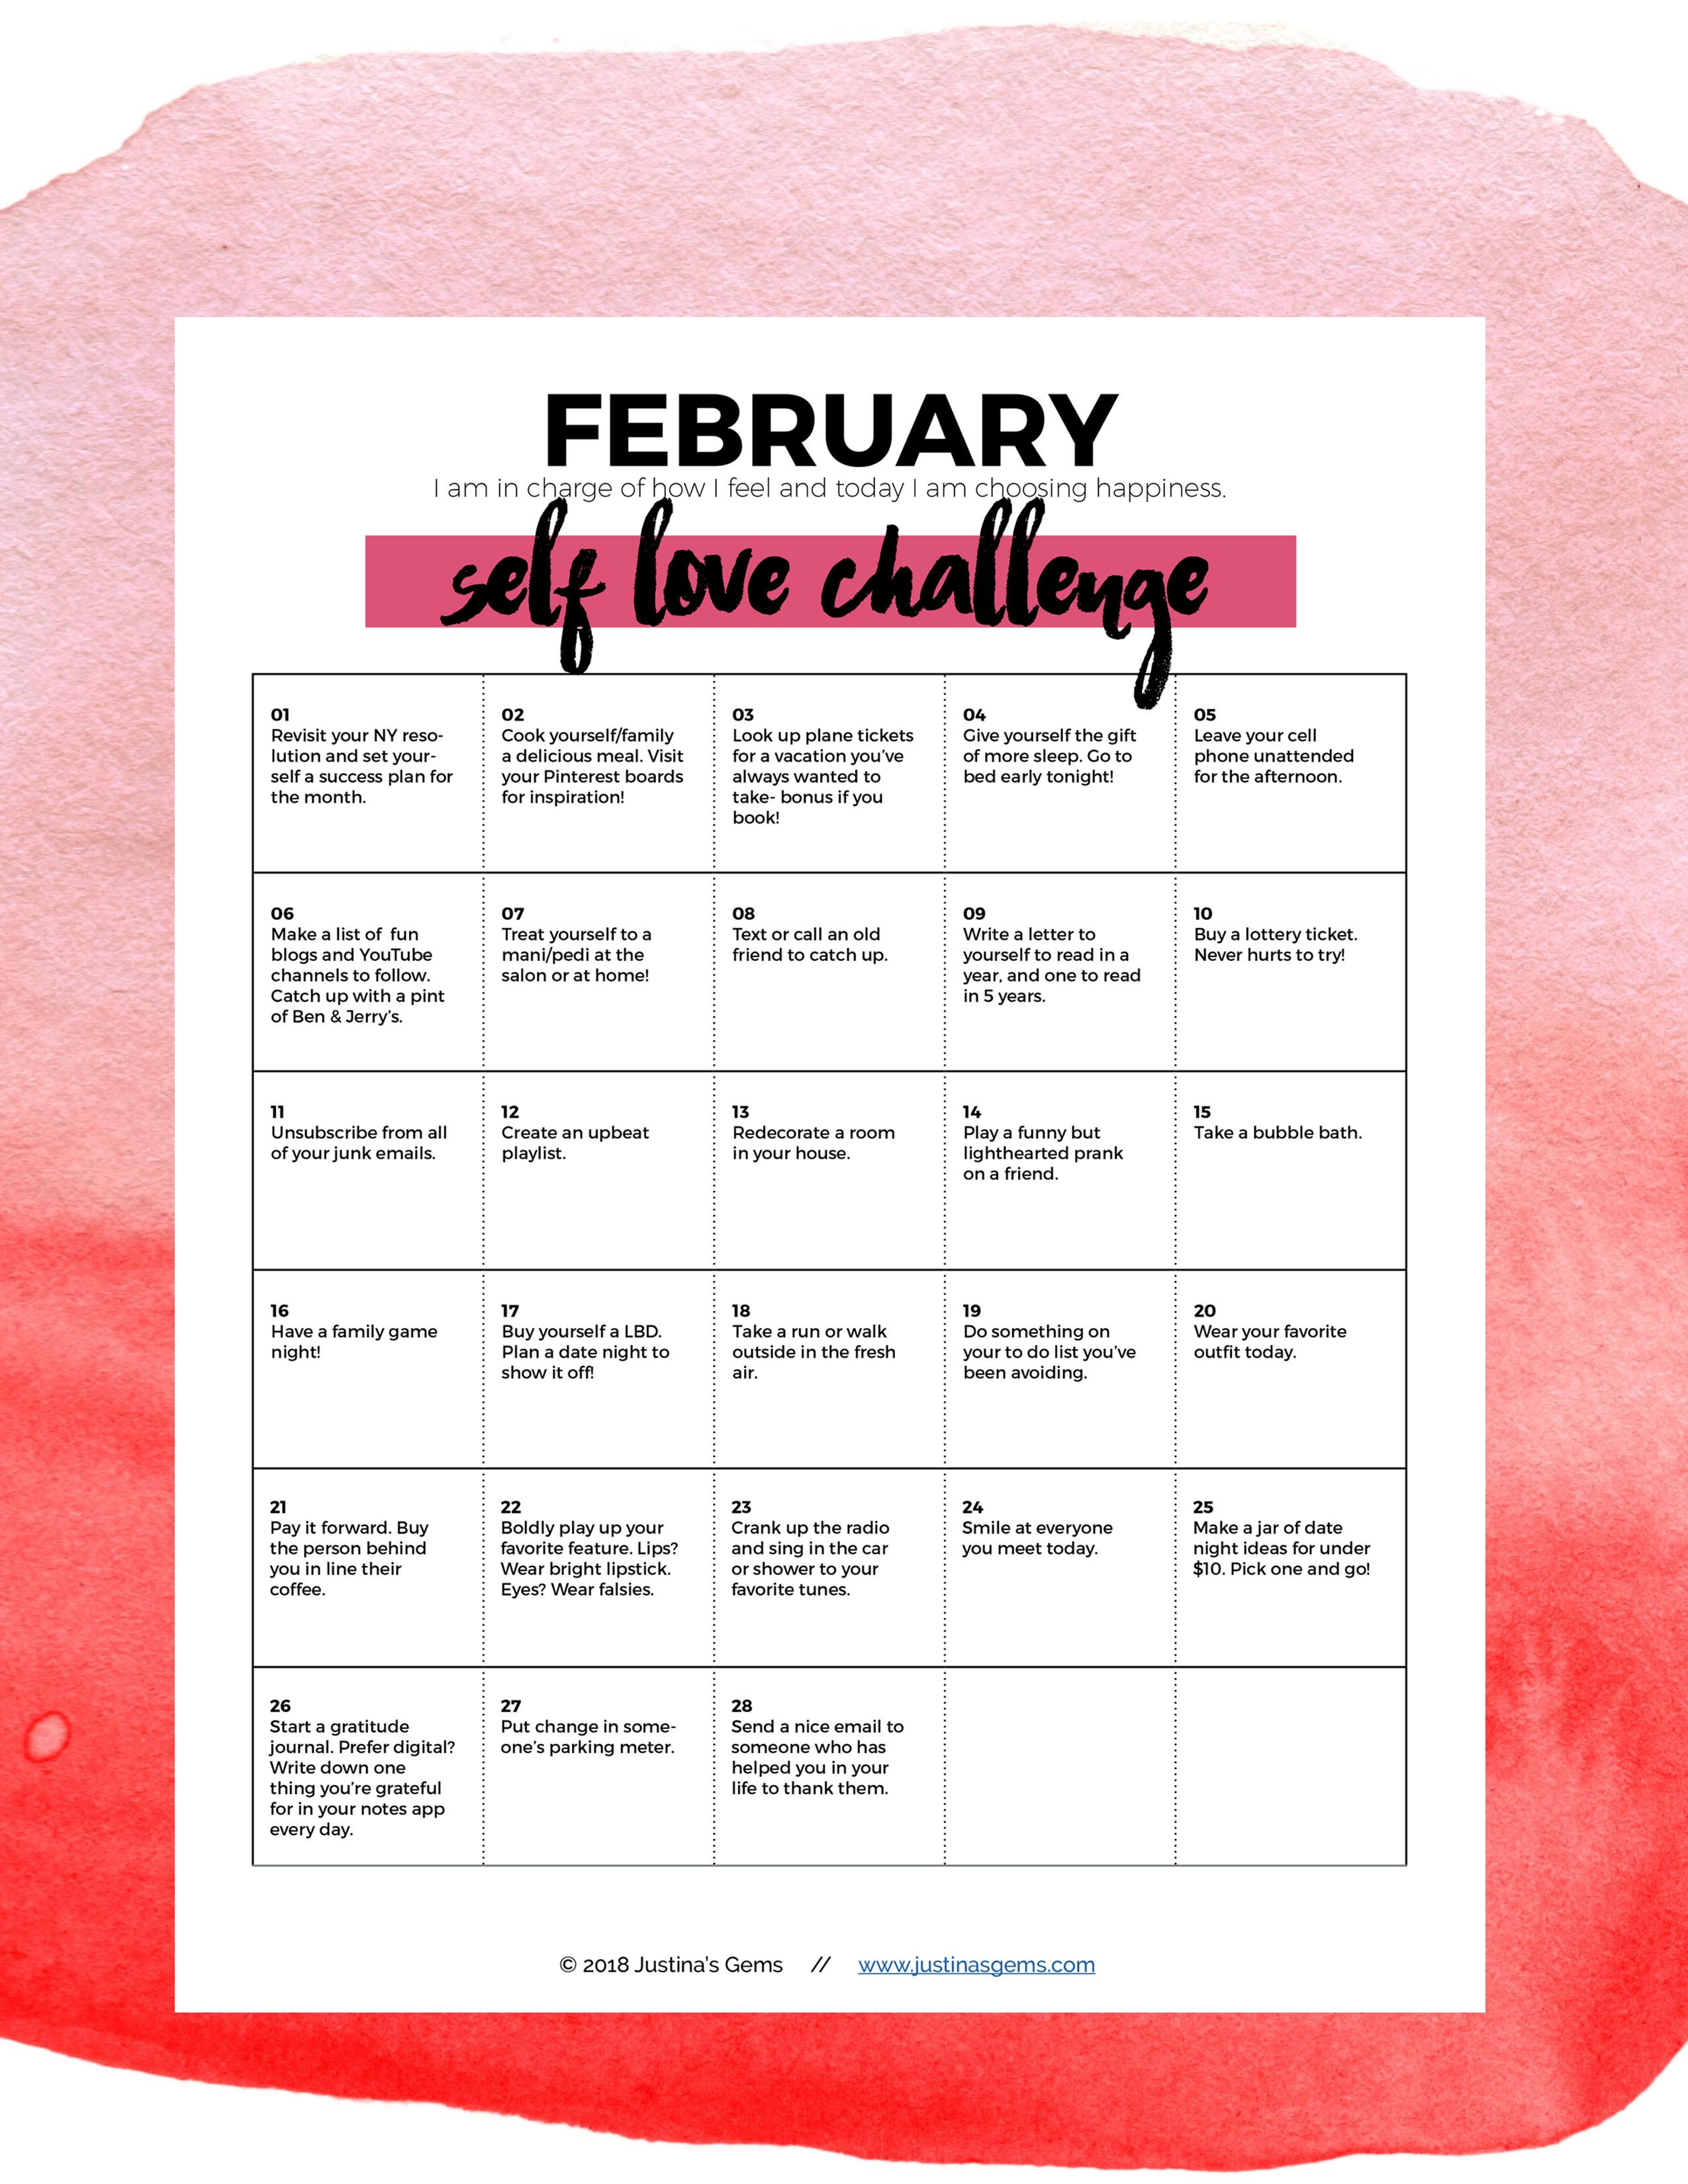 February Self Love Challenge